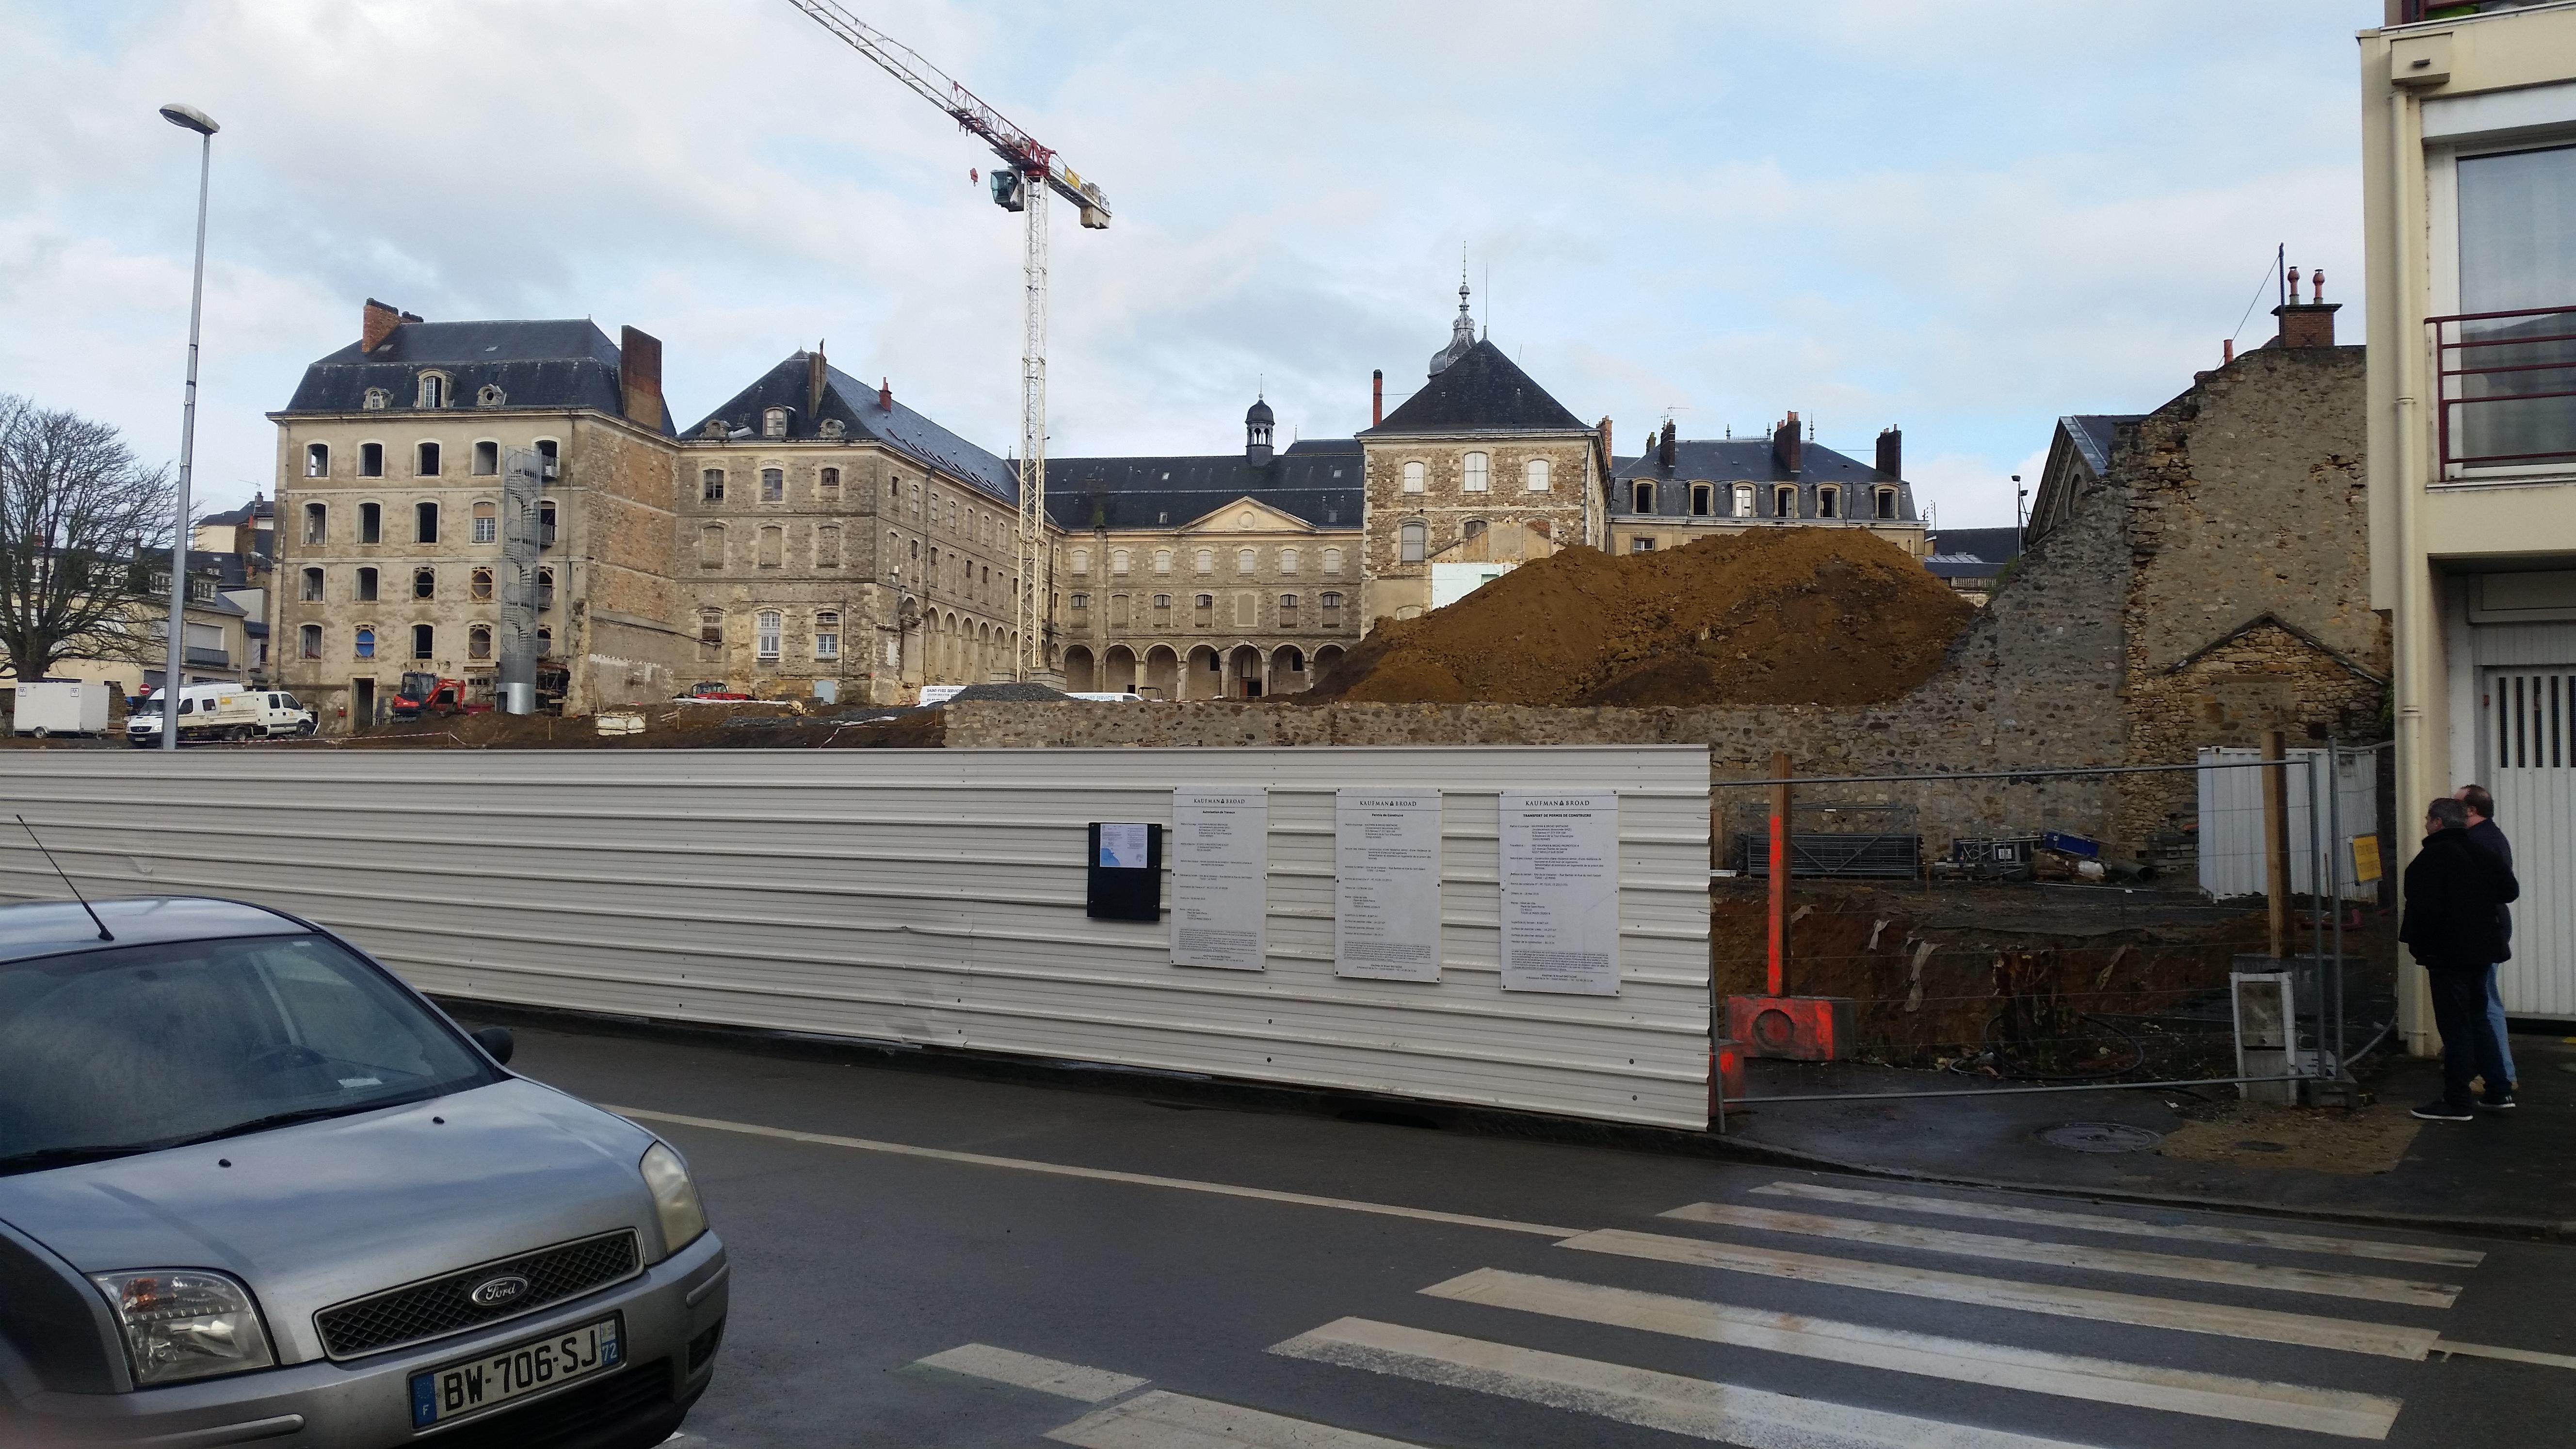 Le Mans - Hôtel Leprince - 23 février 2017 - Vue 01 - (Christophe Menu)